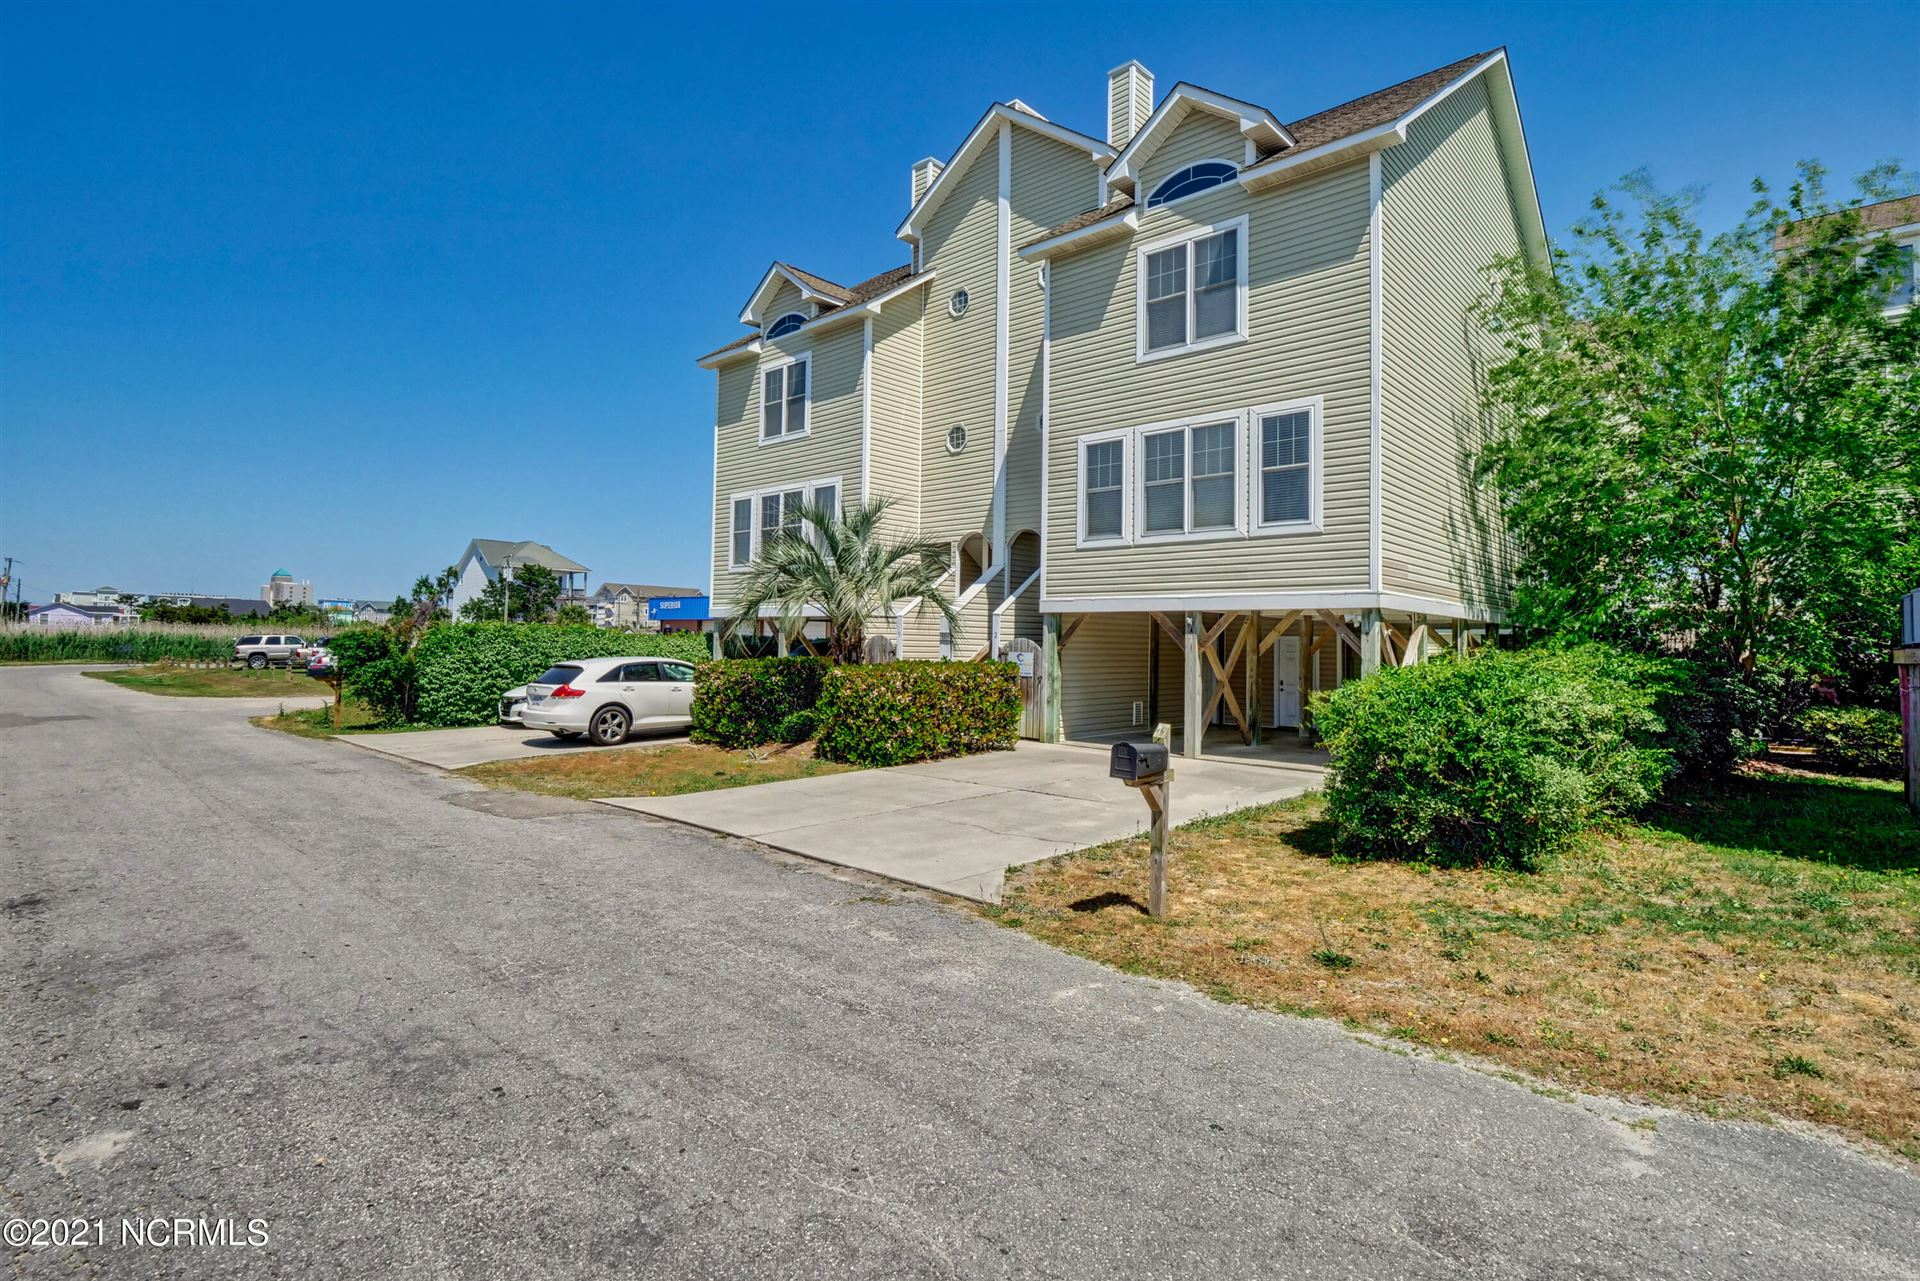 Photo of 805 S Second Street #2, Carolina Beach, NC 28428 (MLS # 100268859)